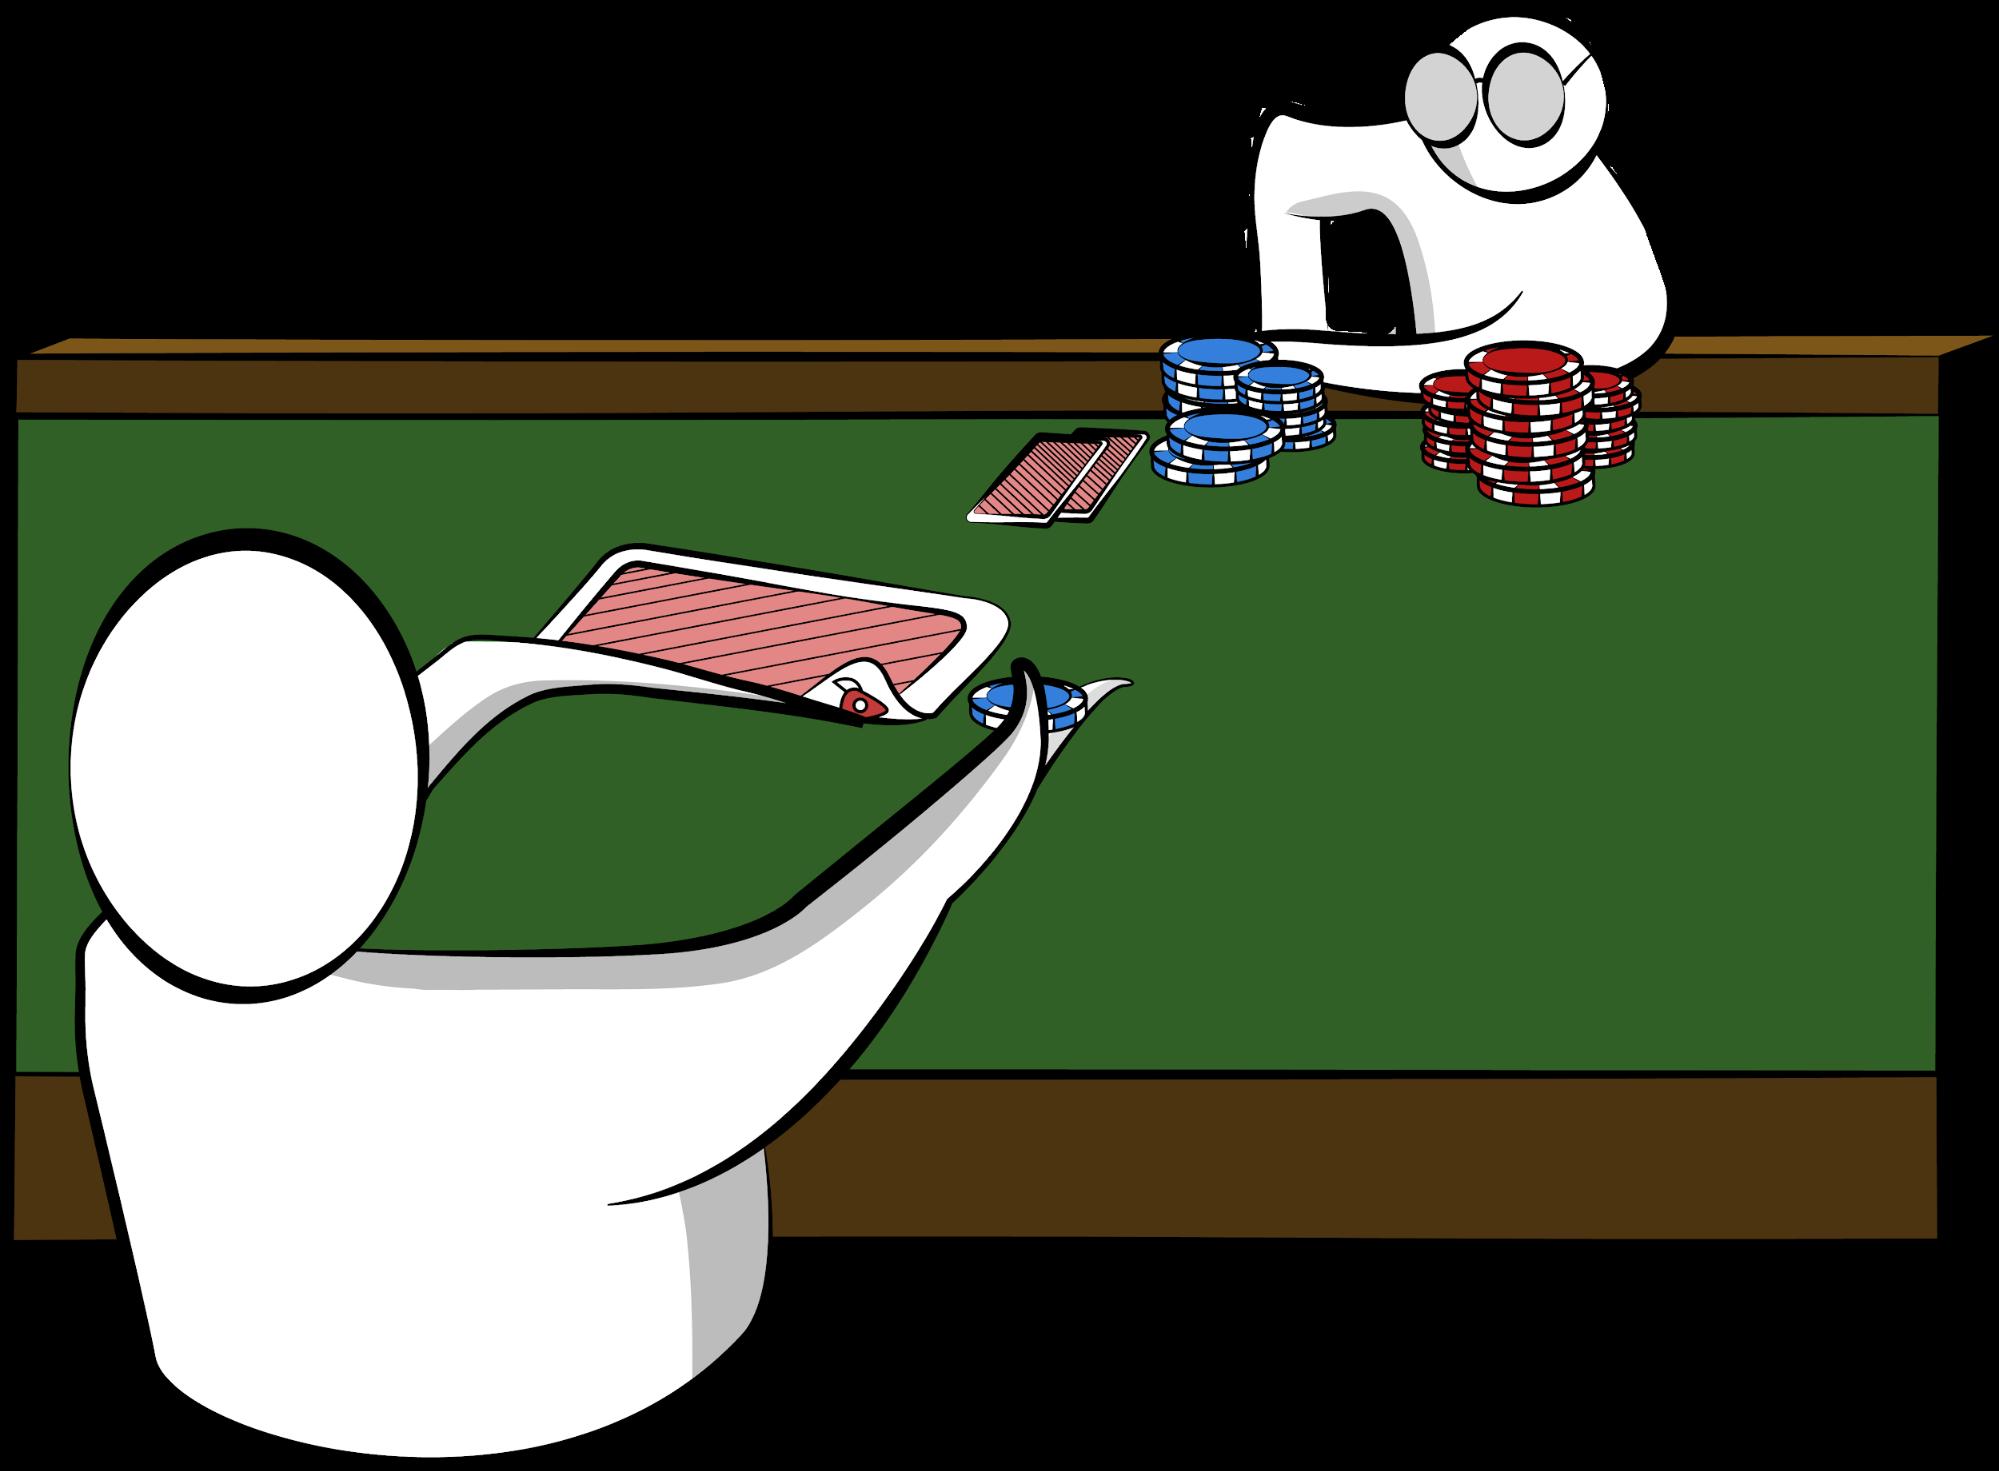 A poker player peeking at a flipped card